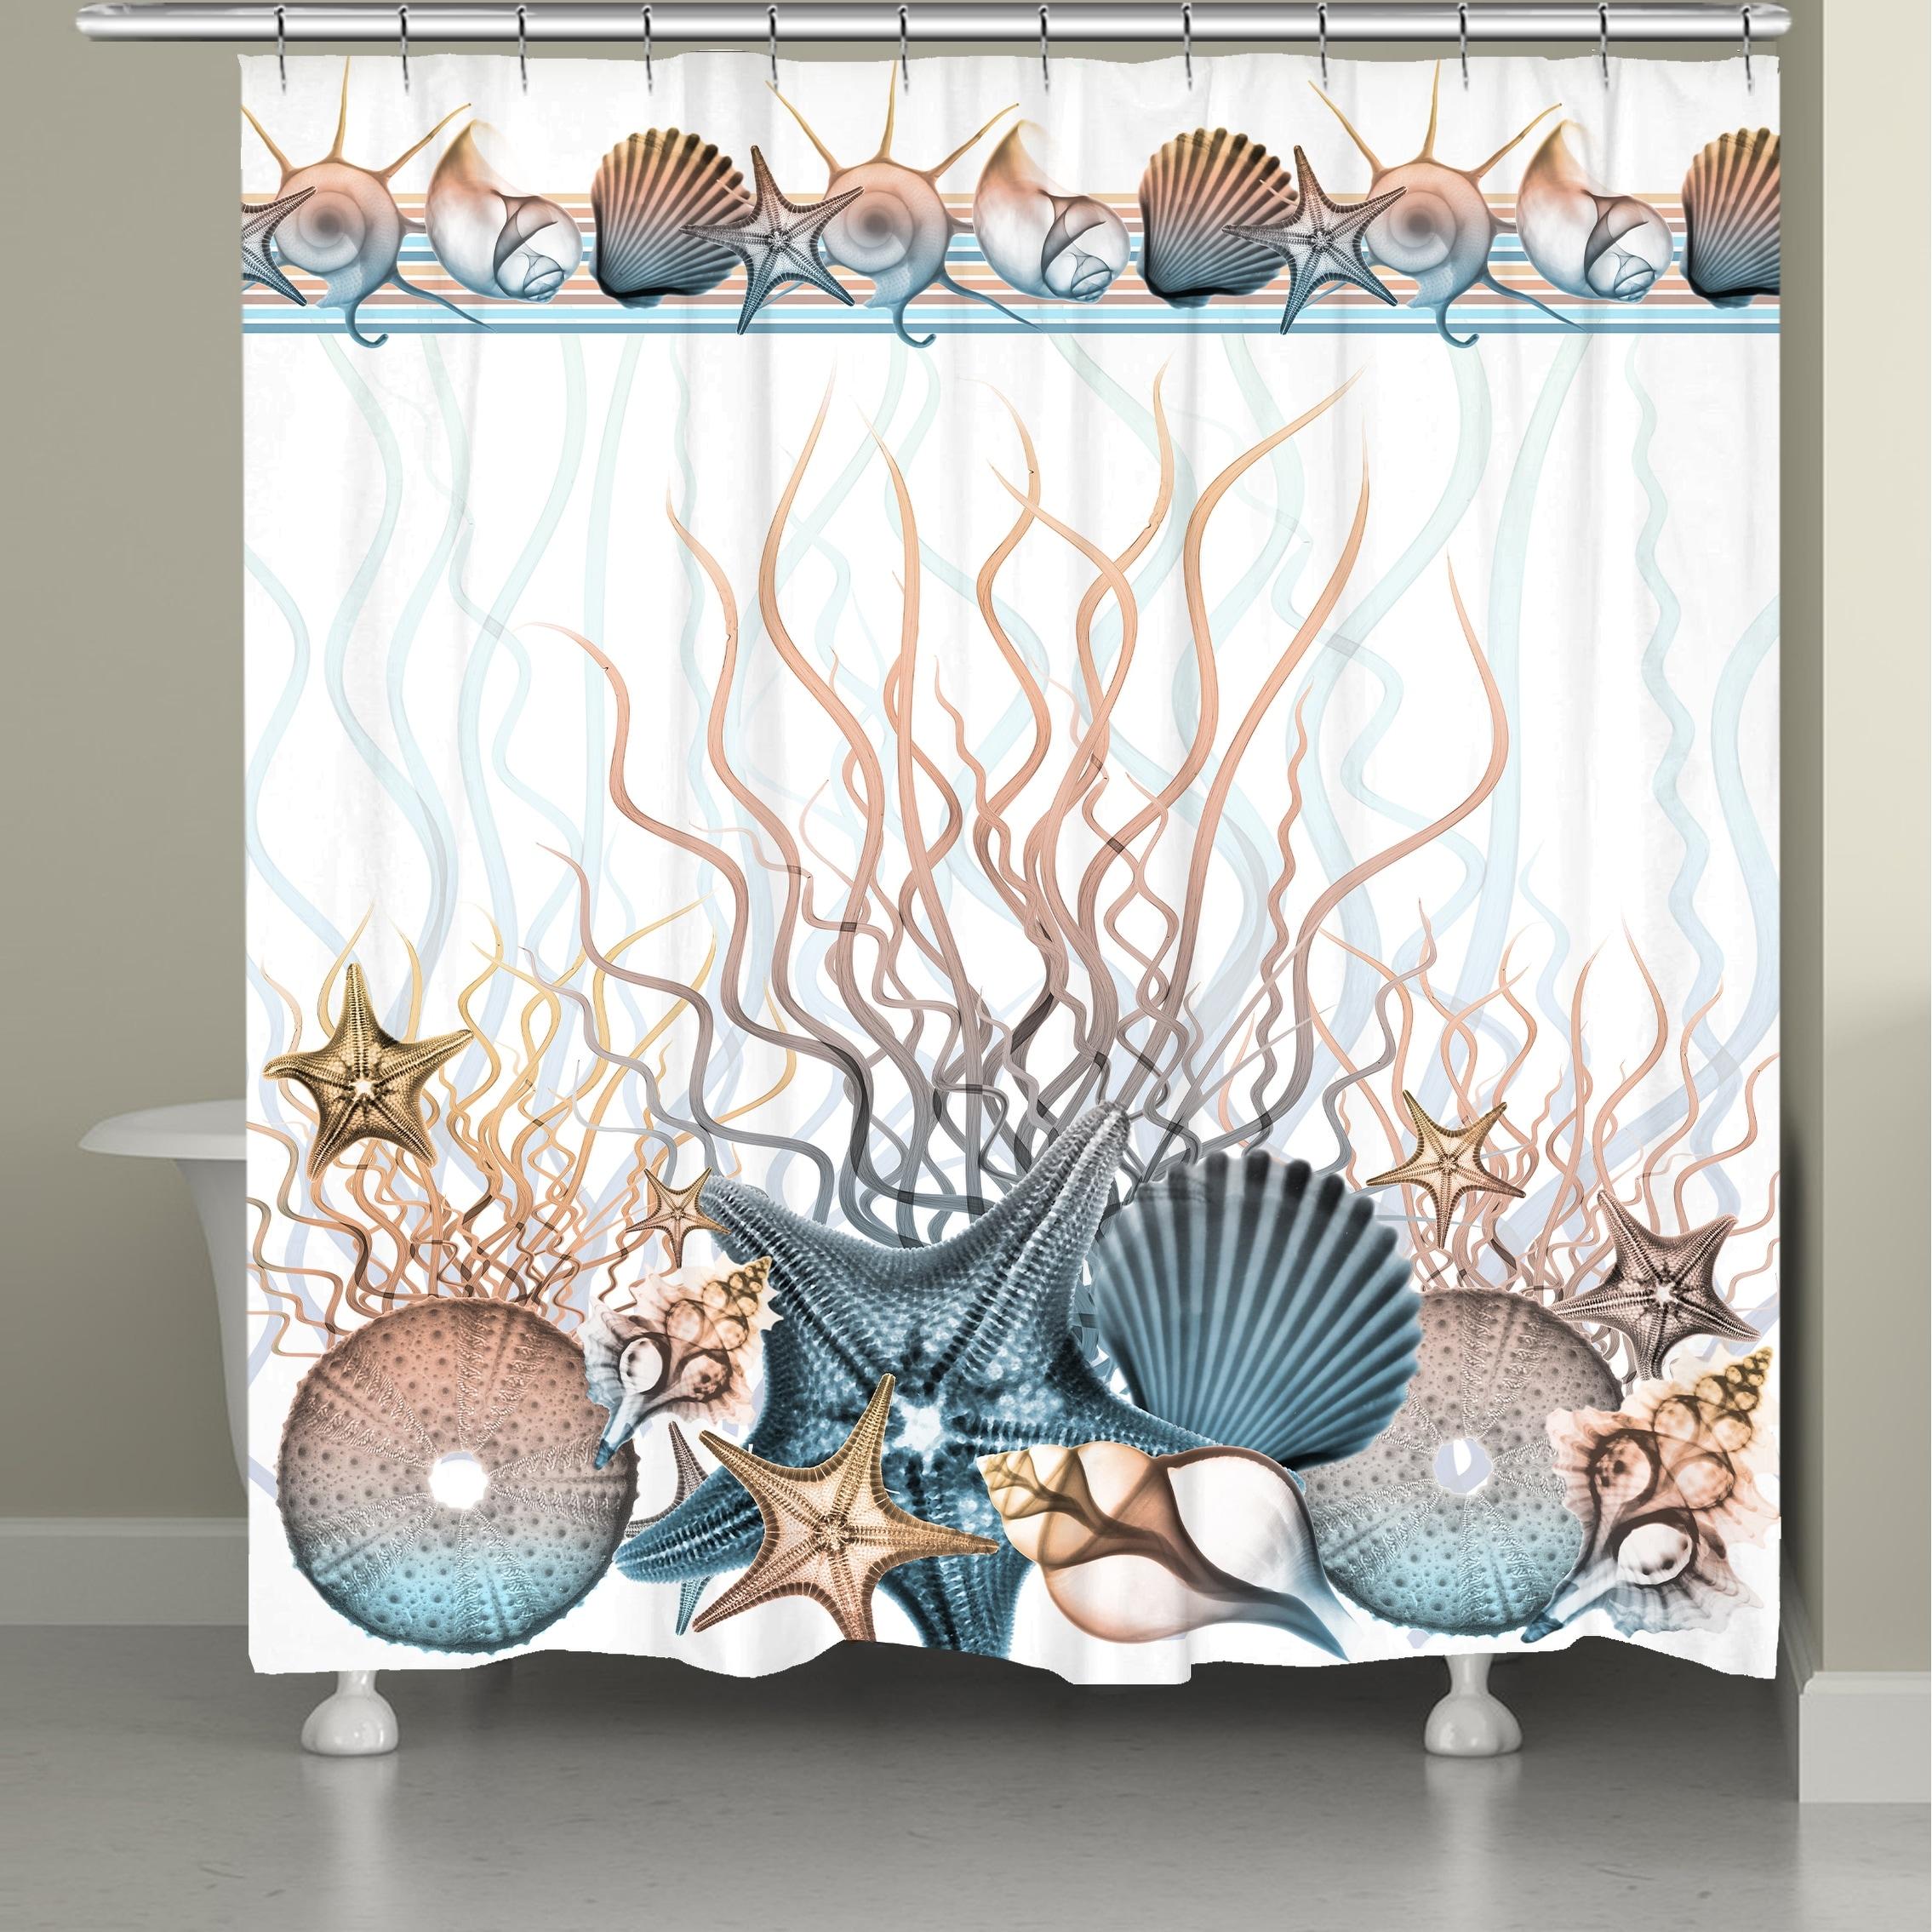 Sunset Seashells Shower Curtain